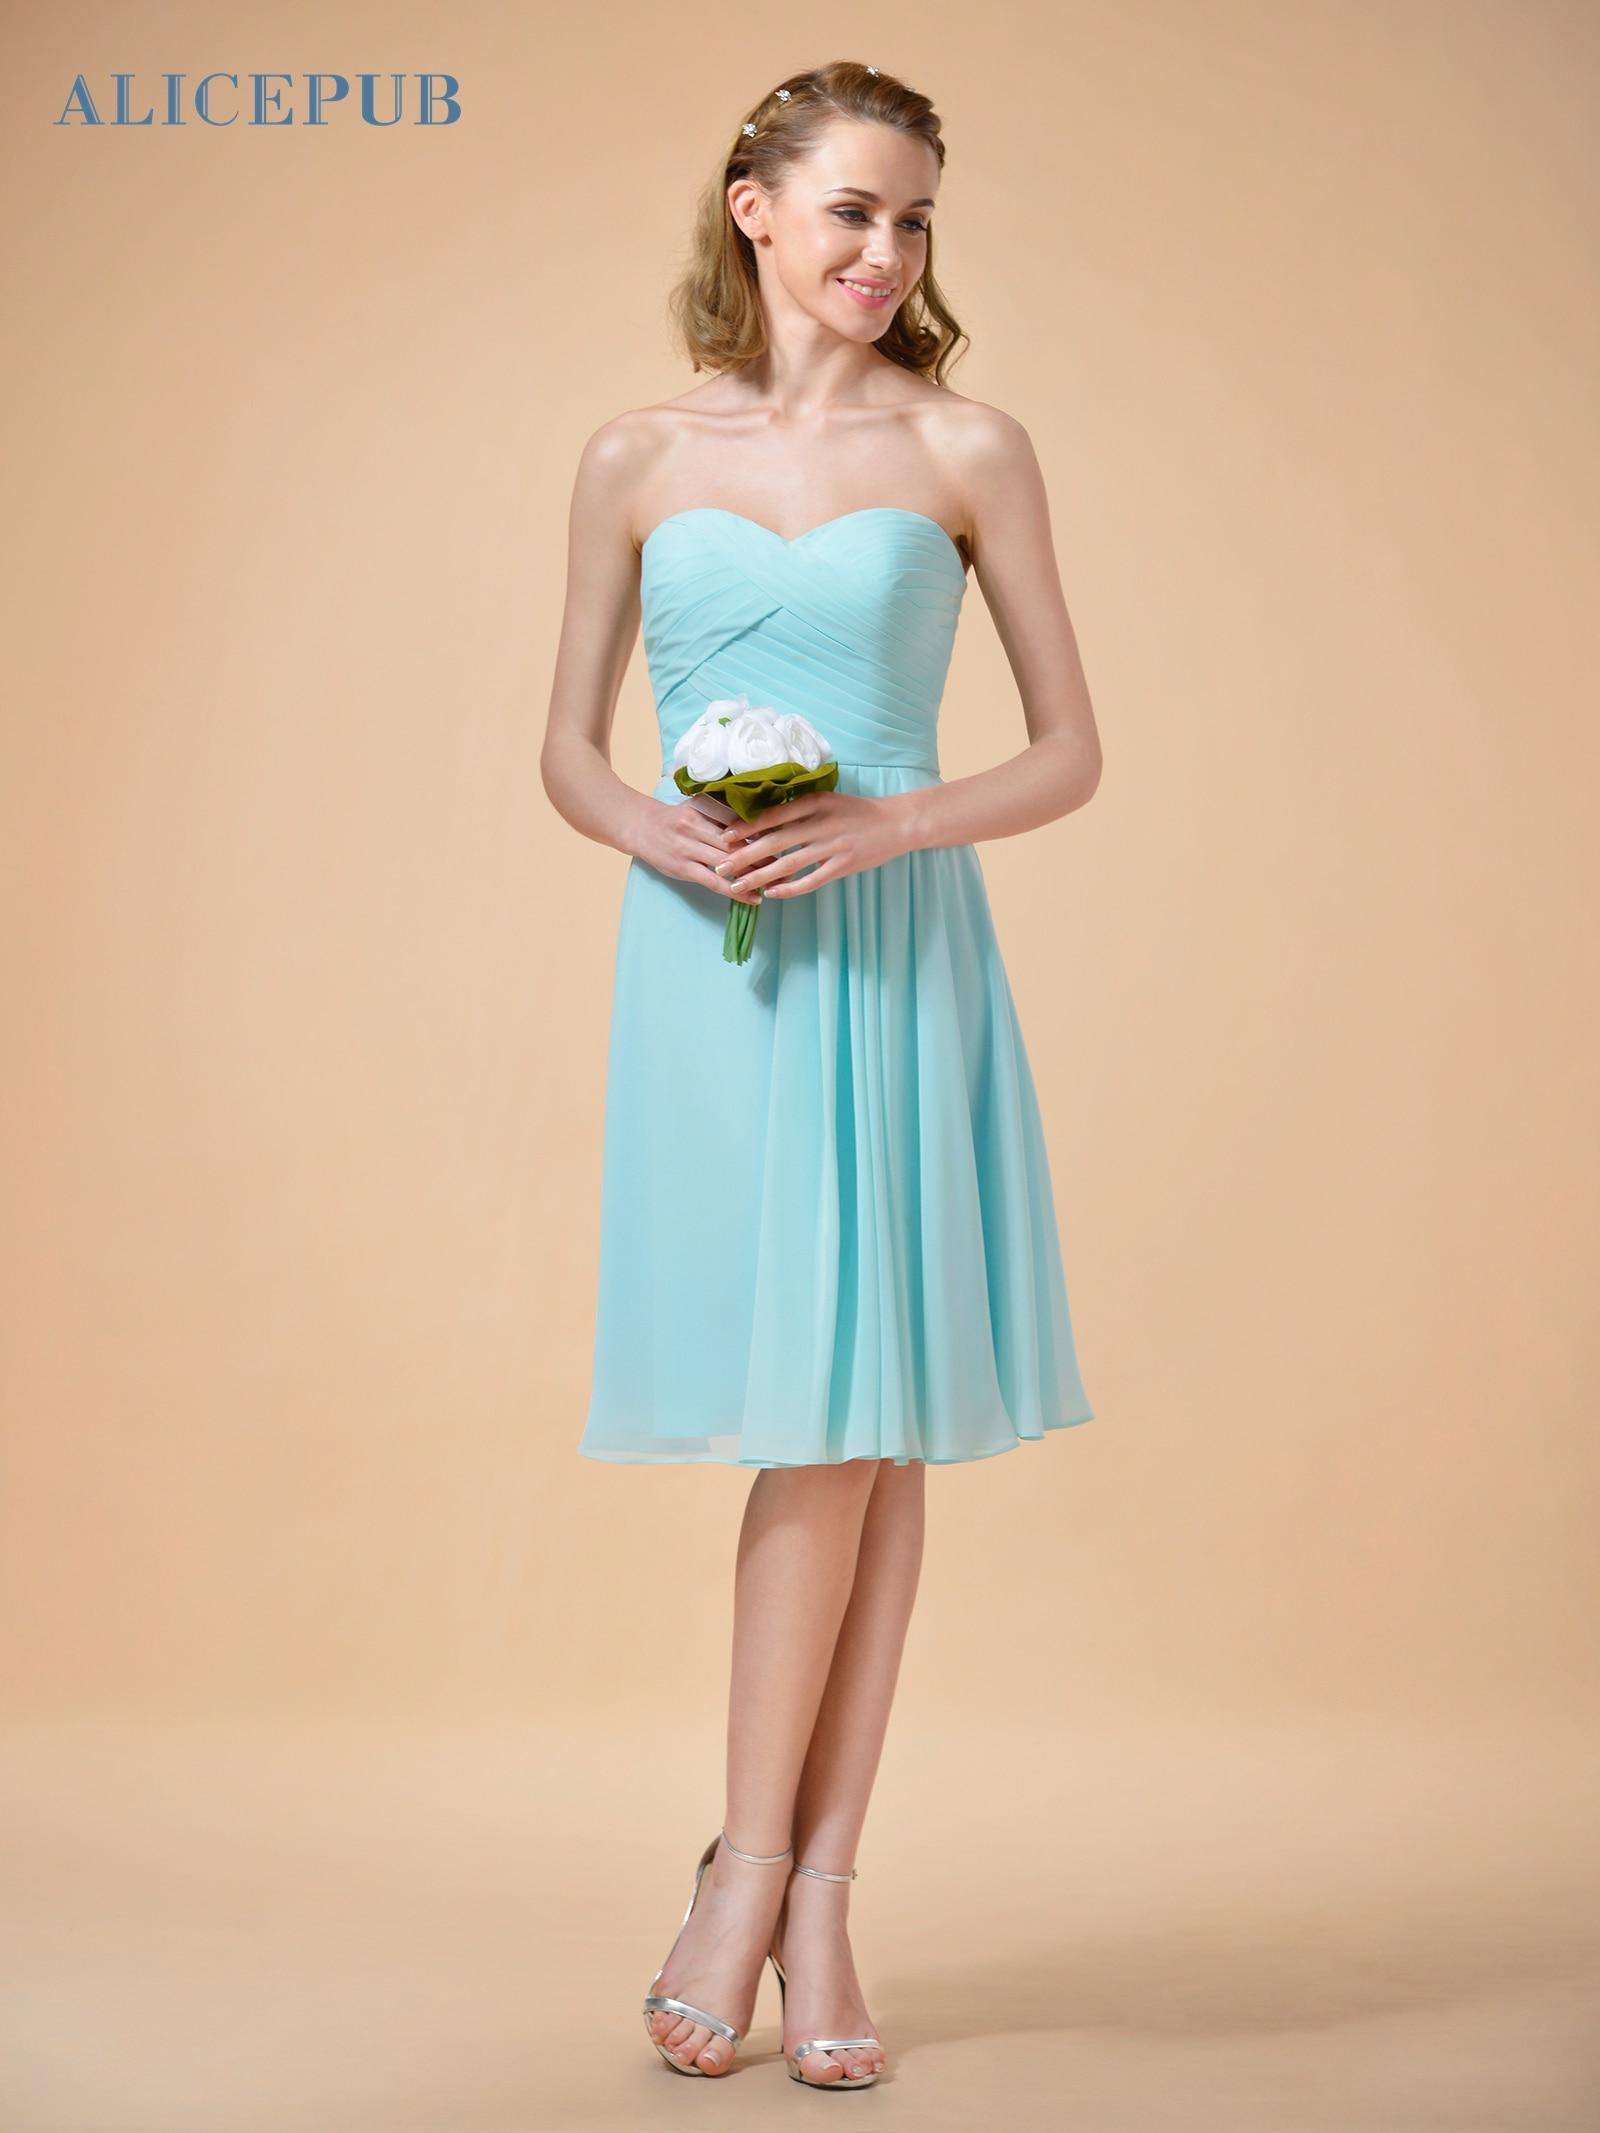 Alicepub Chiffon Bridesmaid Dresses Short Strapless Wedding Prom ...